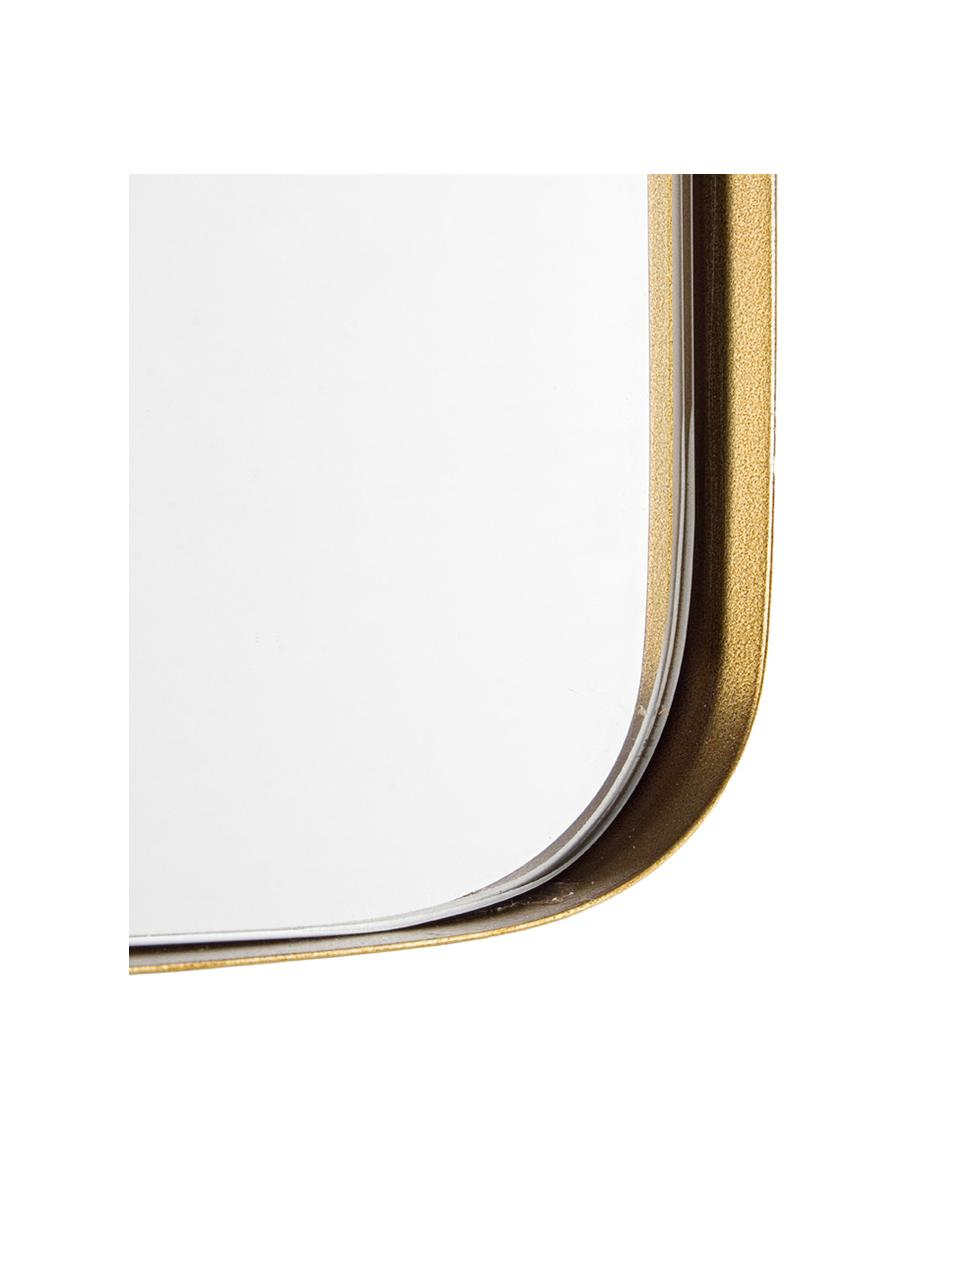 Eckiger Wandspiegel Adhira mit messingfarbenem Metallrahmen, Rahmen: Metall, vermessingt, Spiegelfläche: Spiegelglas, Messingfarben, 60 x 60 cm